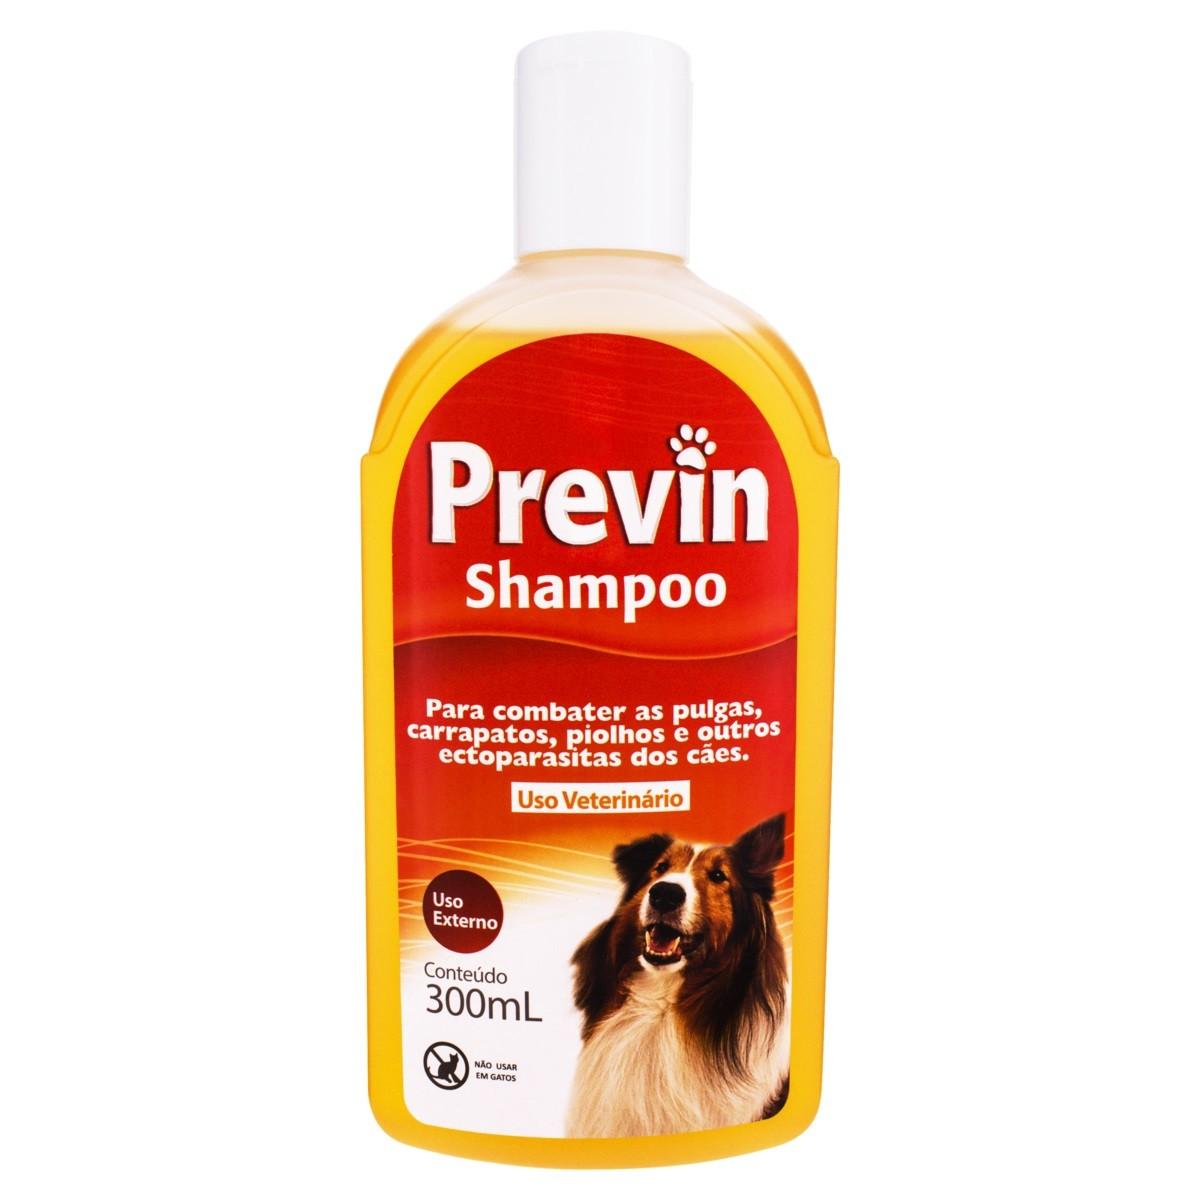 Shampoo Previn Antipulgas e Carrapatos 300ml